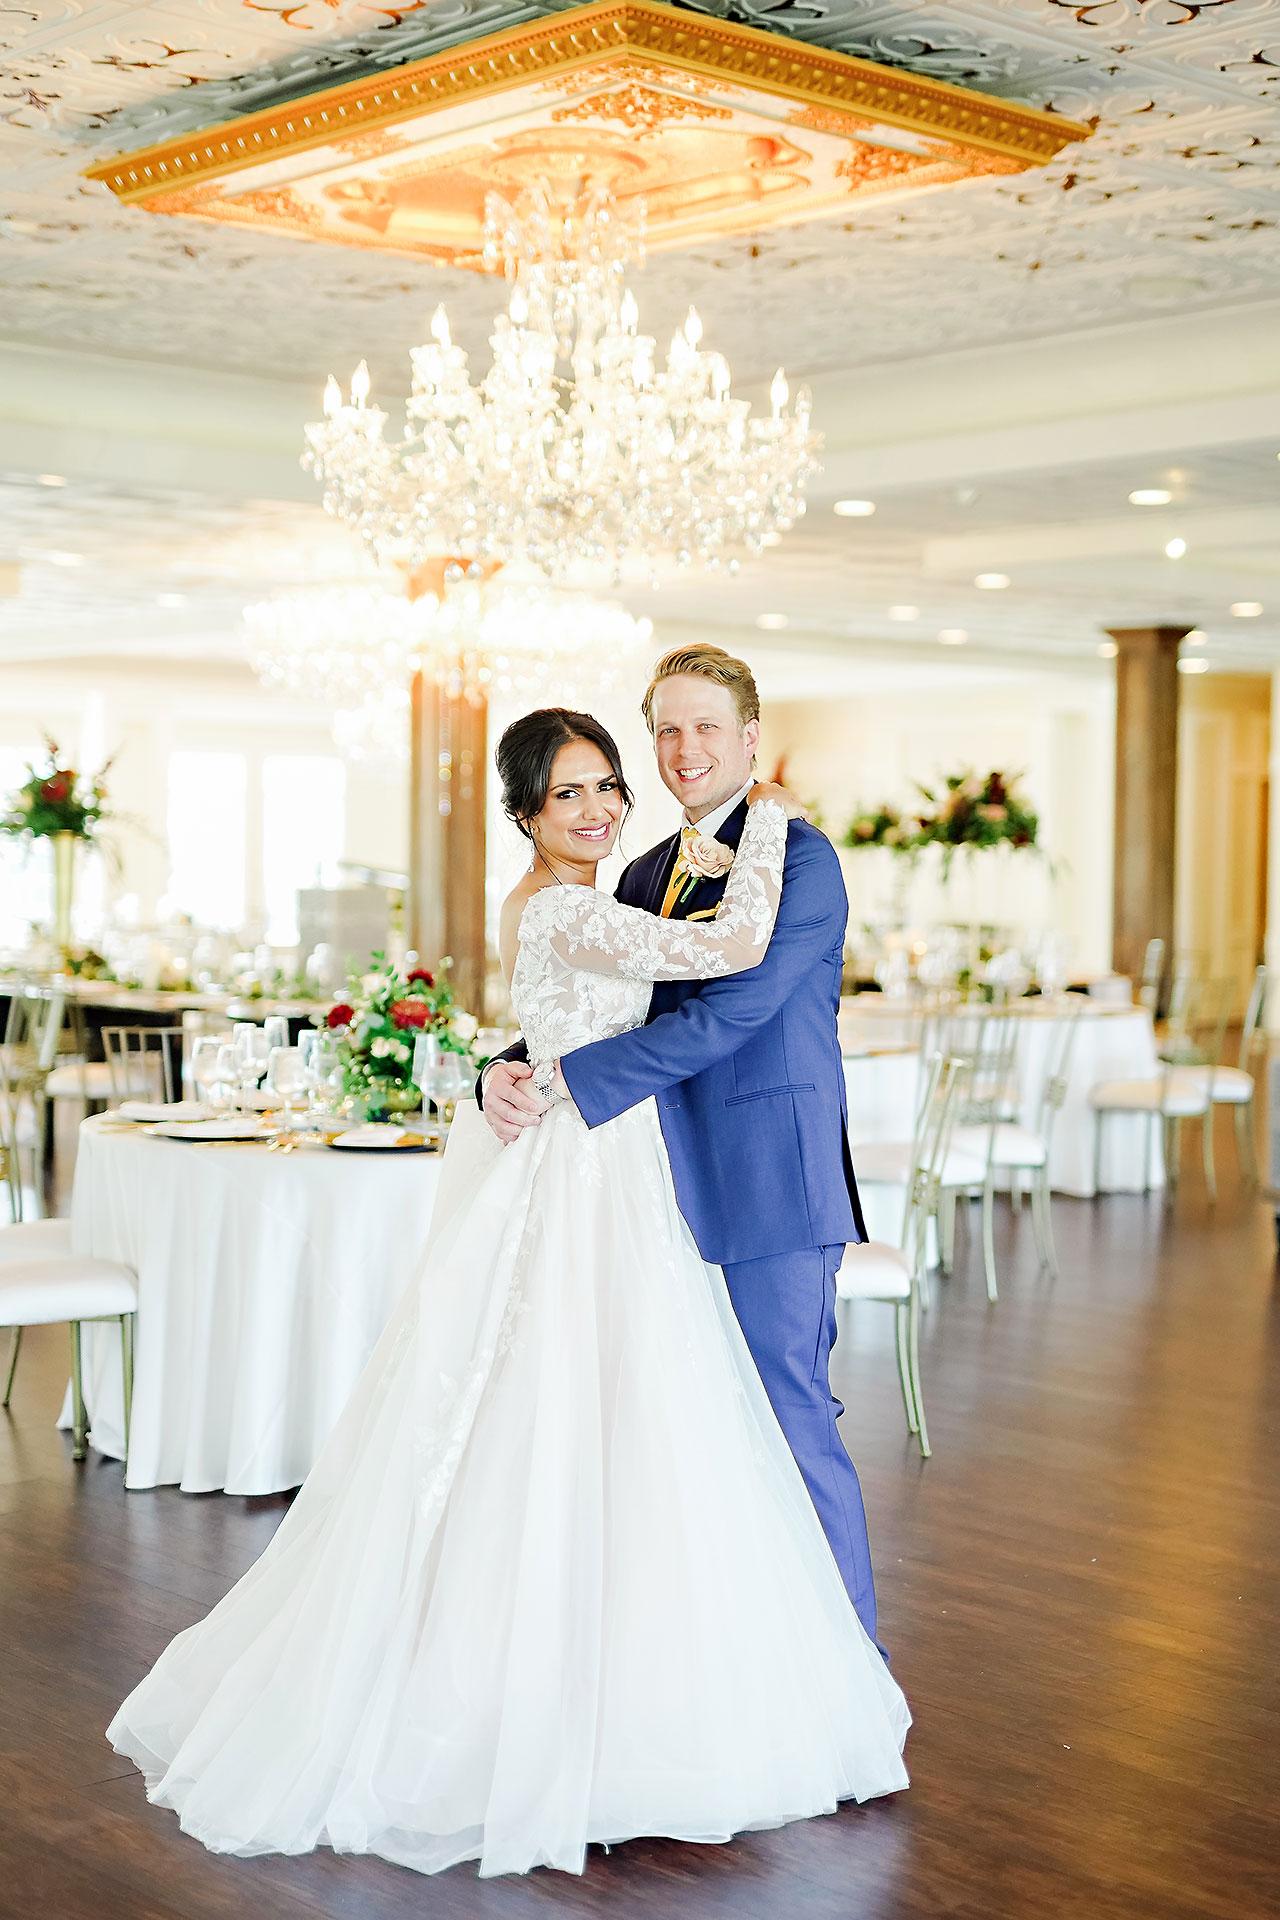 Nadia Parker Black Iris Estate Carmel Indiana Wedding May 2021 206